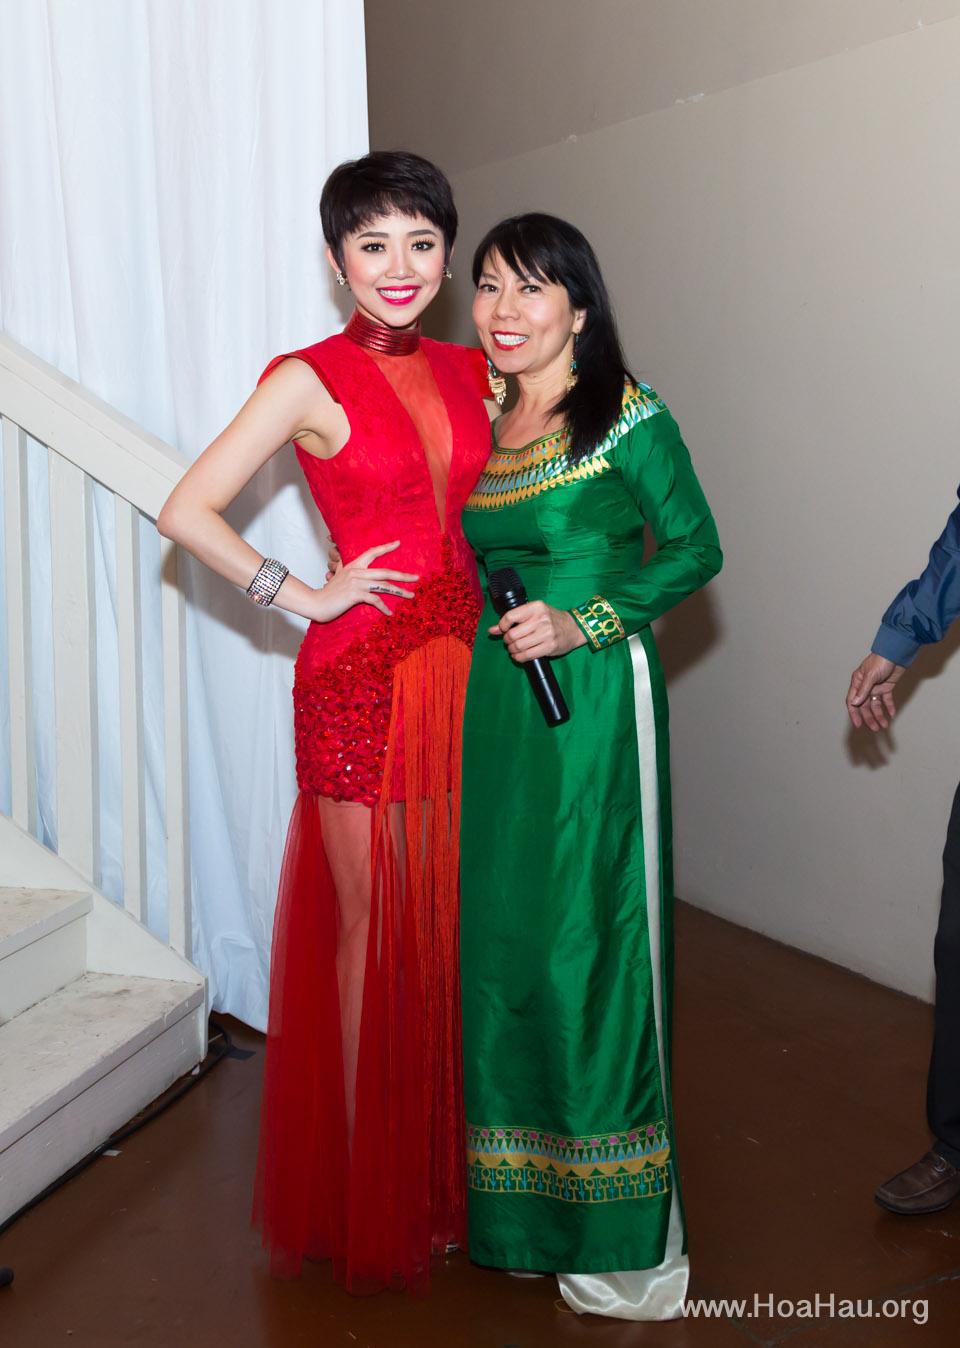 Tet Fairgrounds 2014 - Hoa Hậu Áo Dài Bắc Cali - Miss Vietnam of Northern California - Image 138